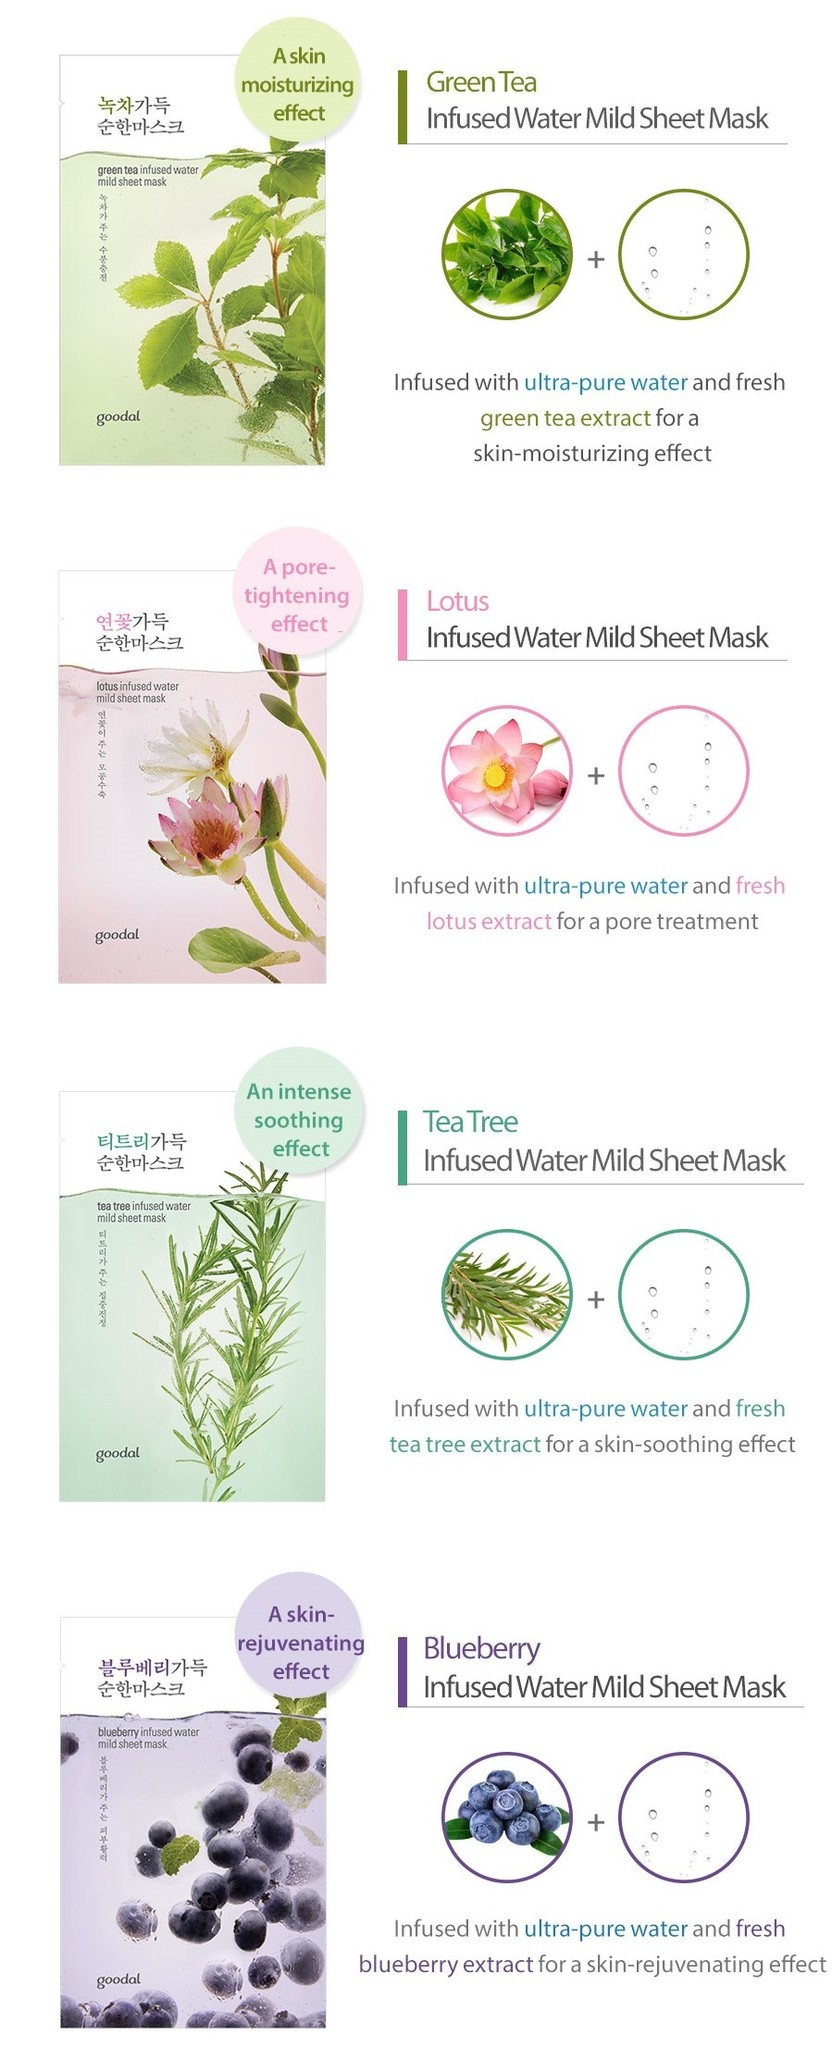 greentea infused water mild sheet mask-6